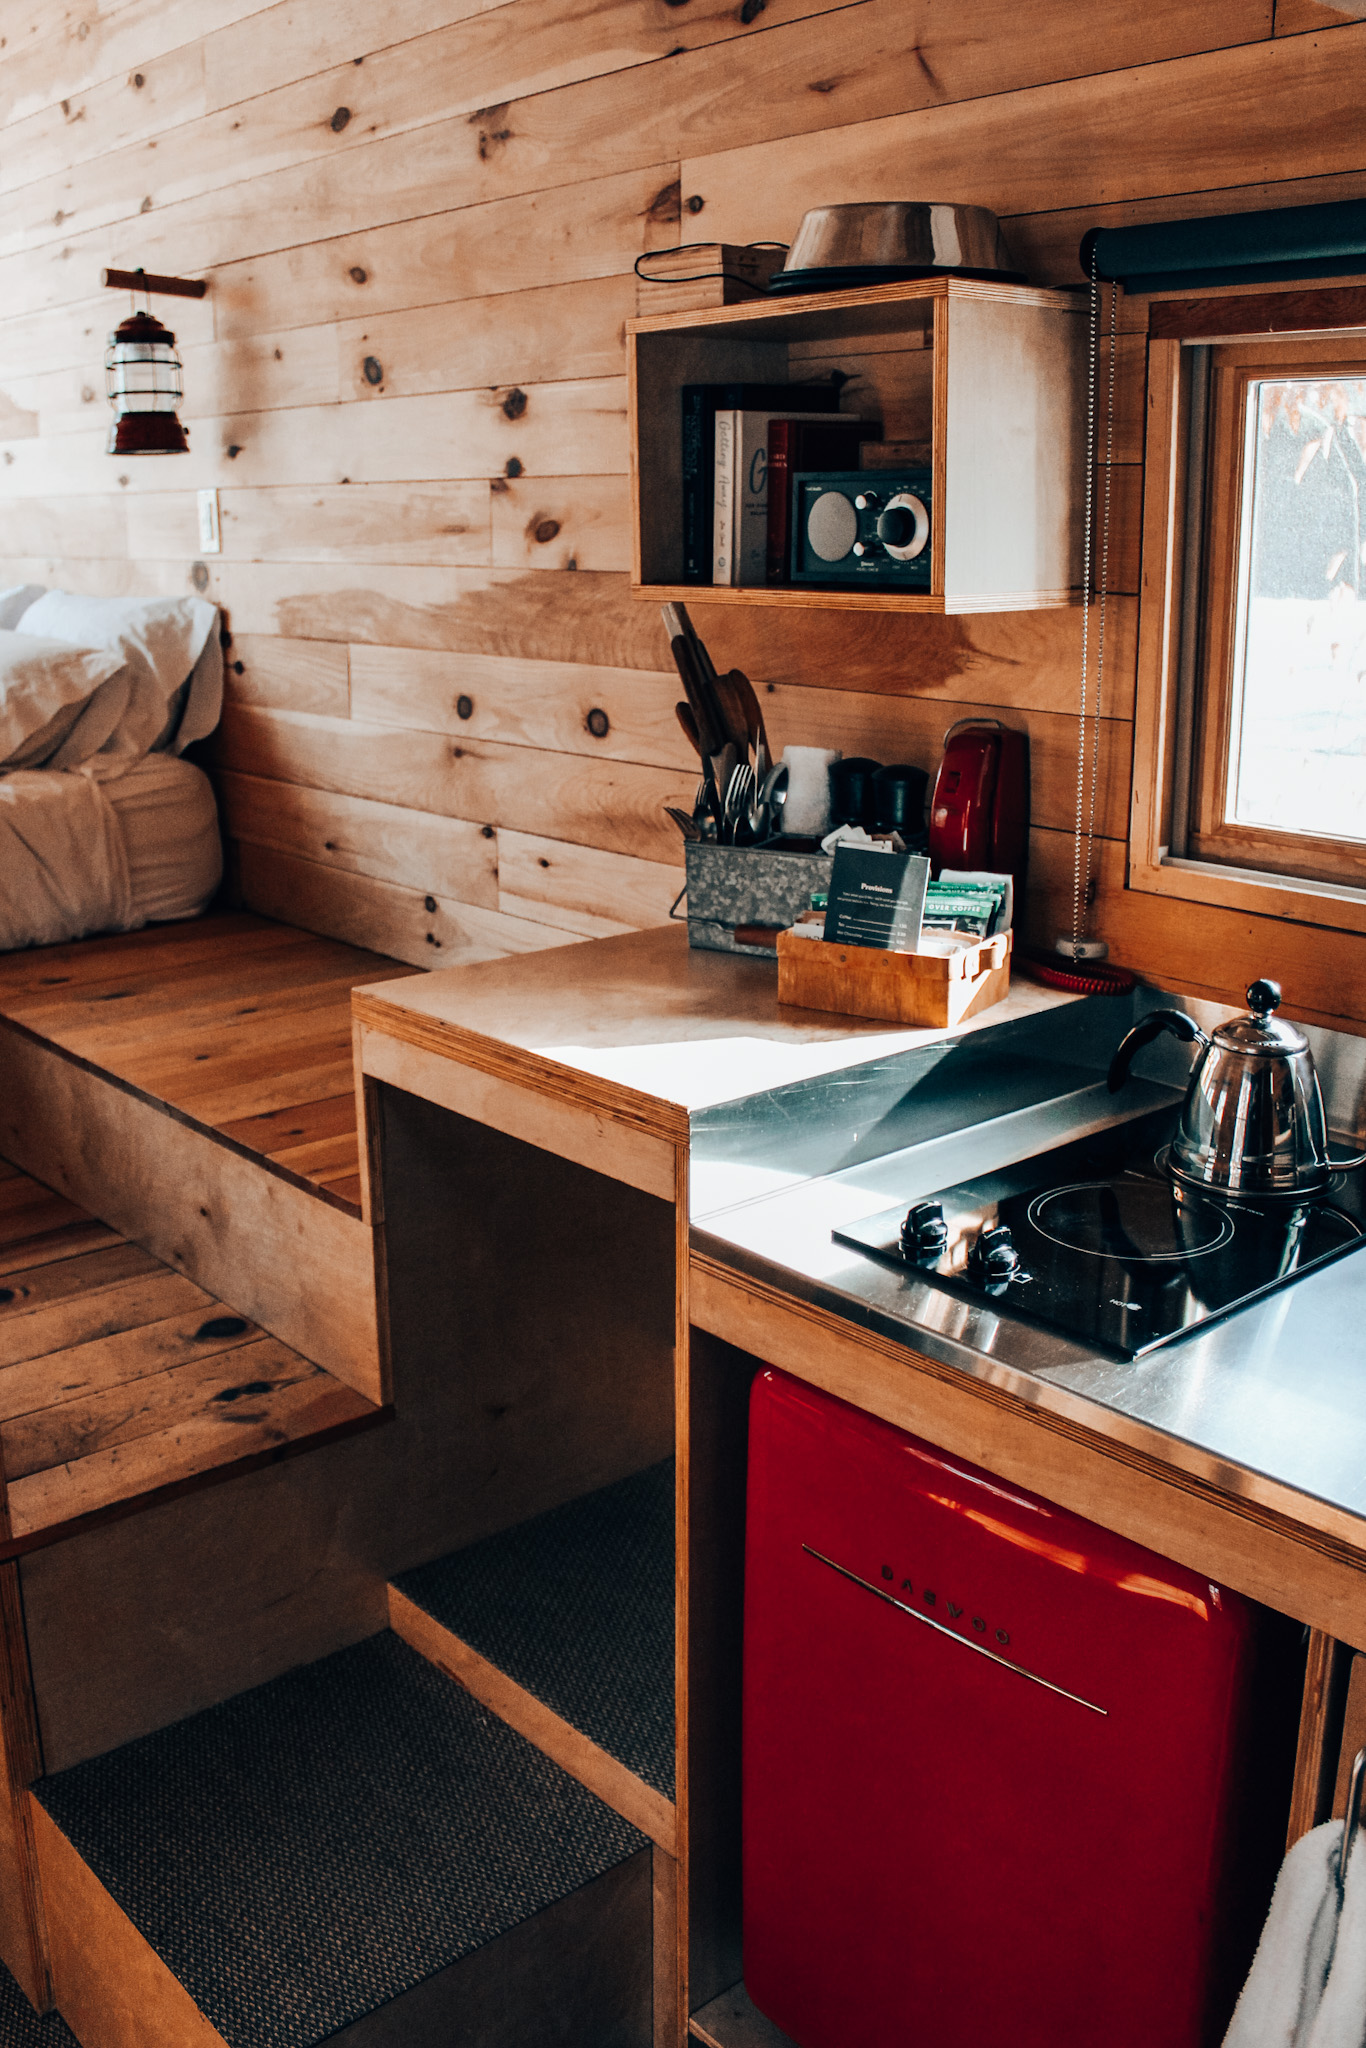 Getaway's kitchen